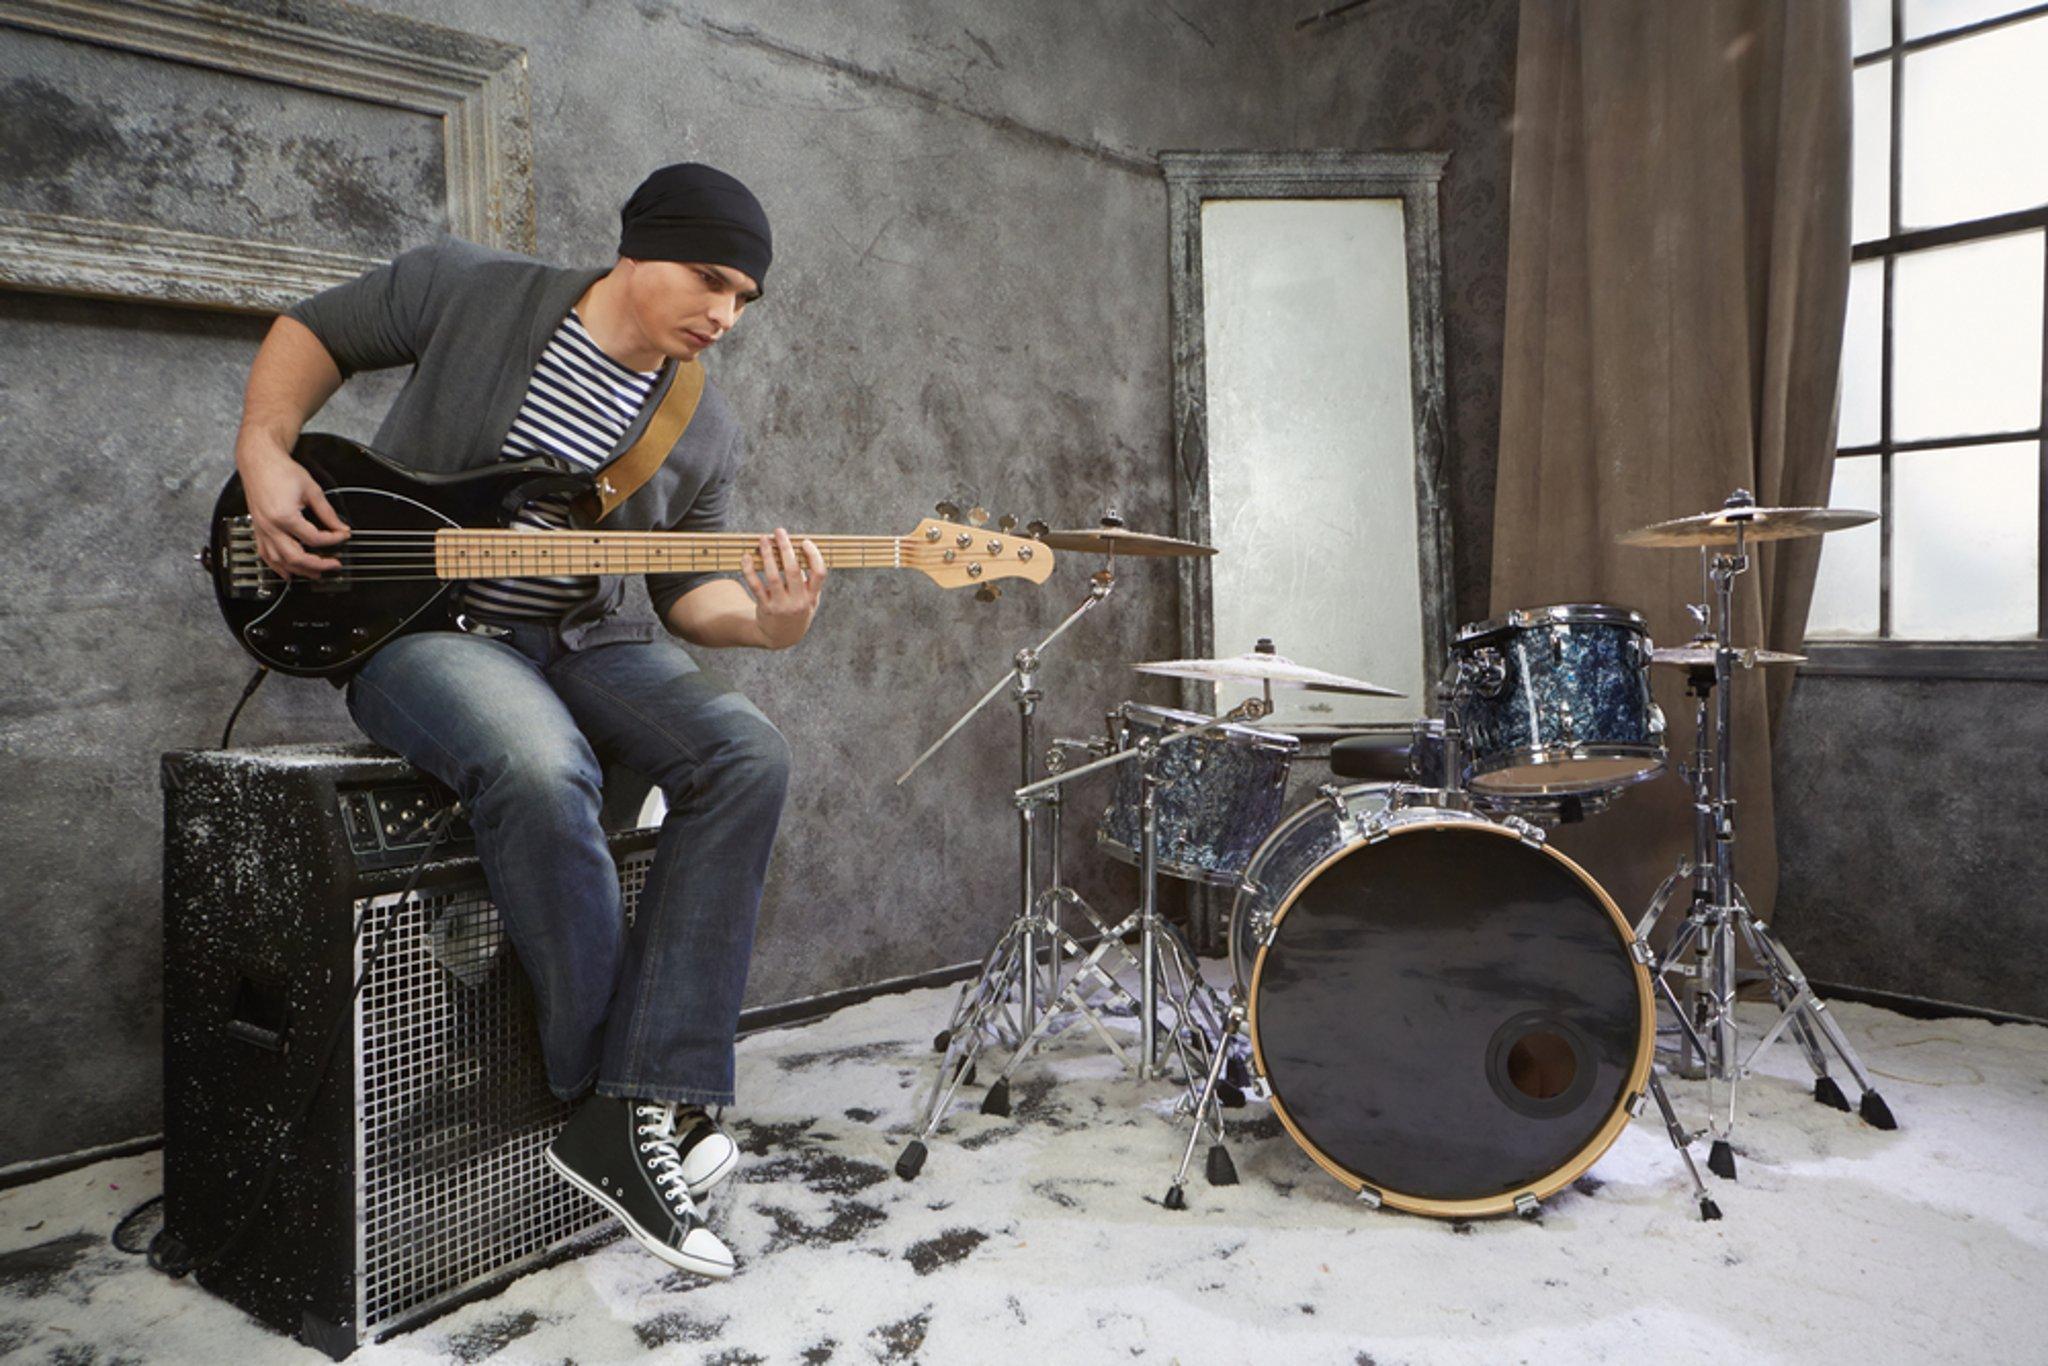 Music (Equipment) - cover